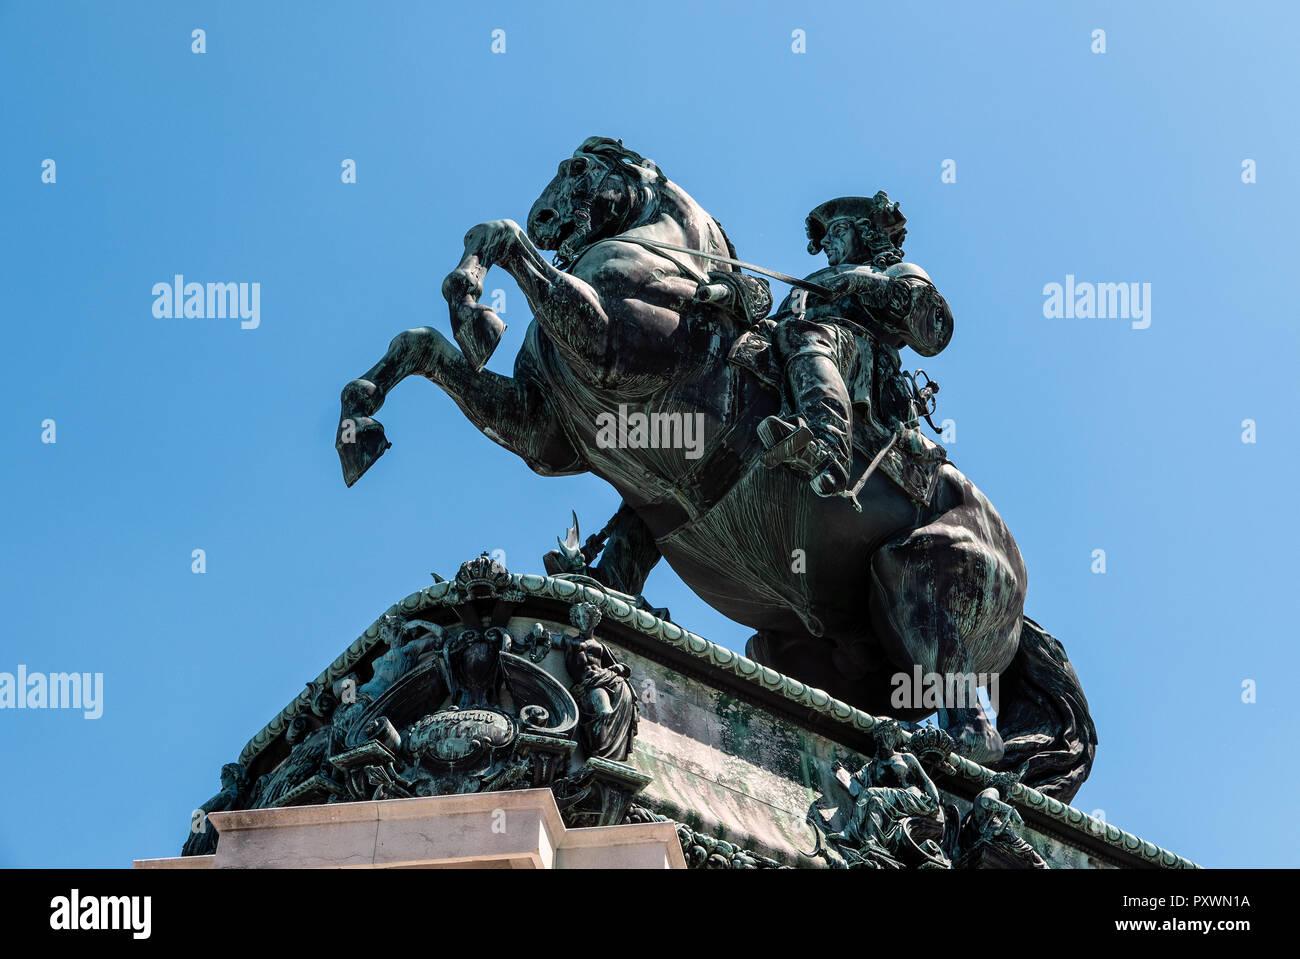 Price Eugene of Savoy (1663-1736) on his war stallion at Heldeplatz, Hofburg comissioned by Kaiser Frantz Joseph and finished 1865. - Stock Image